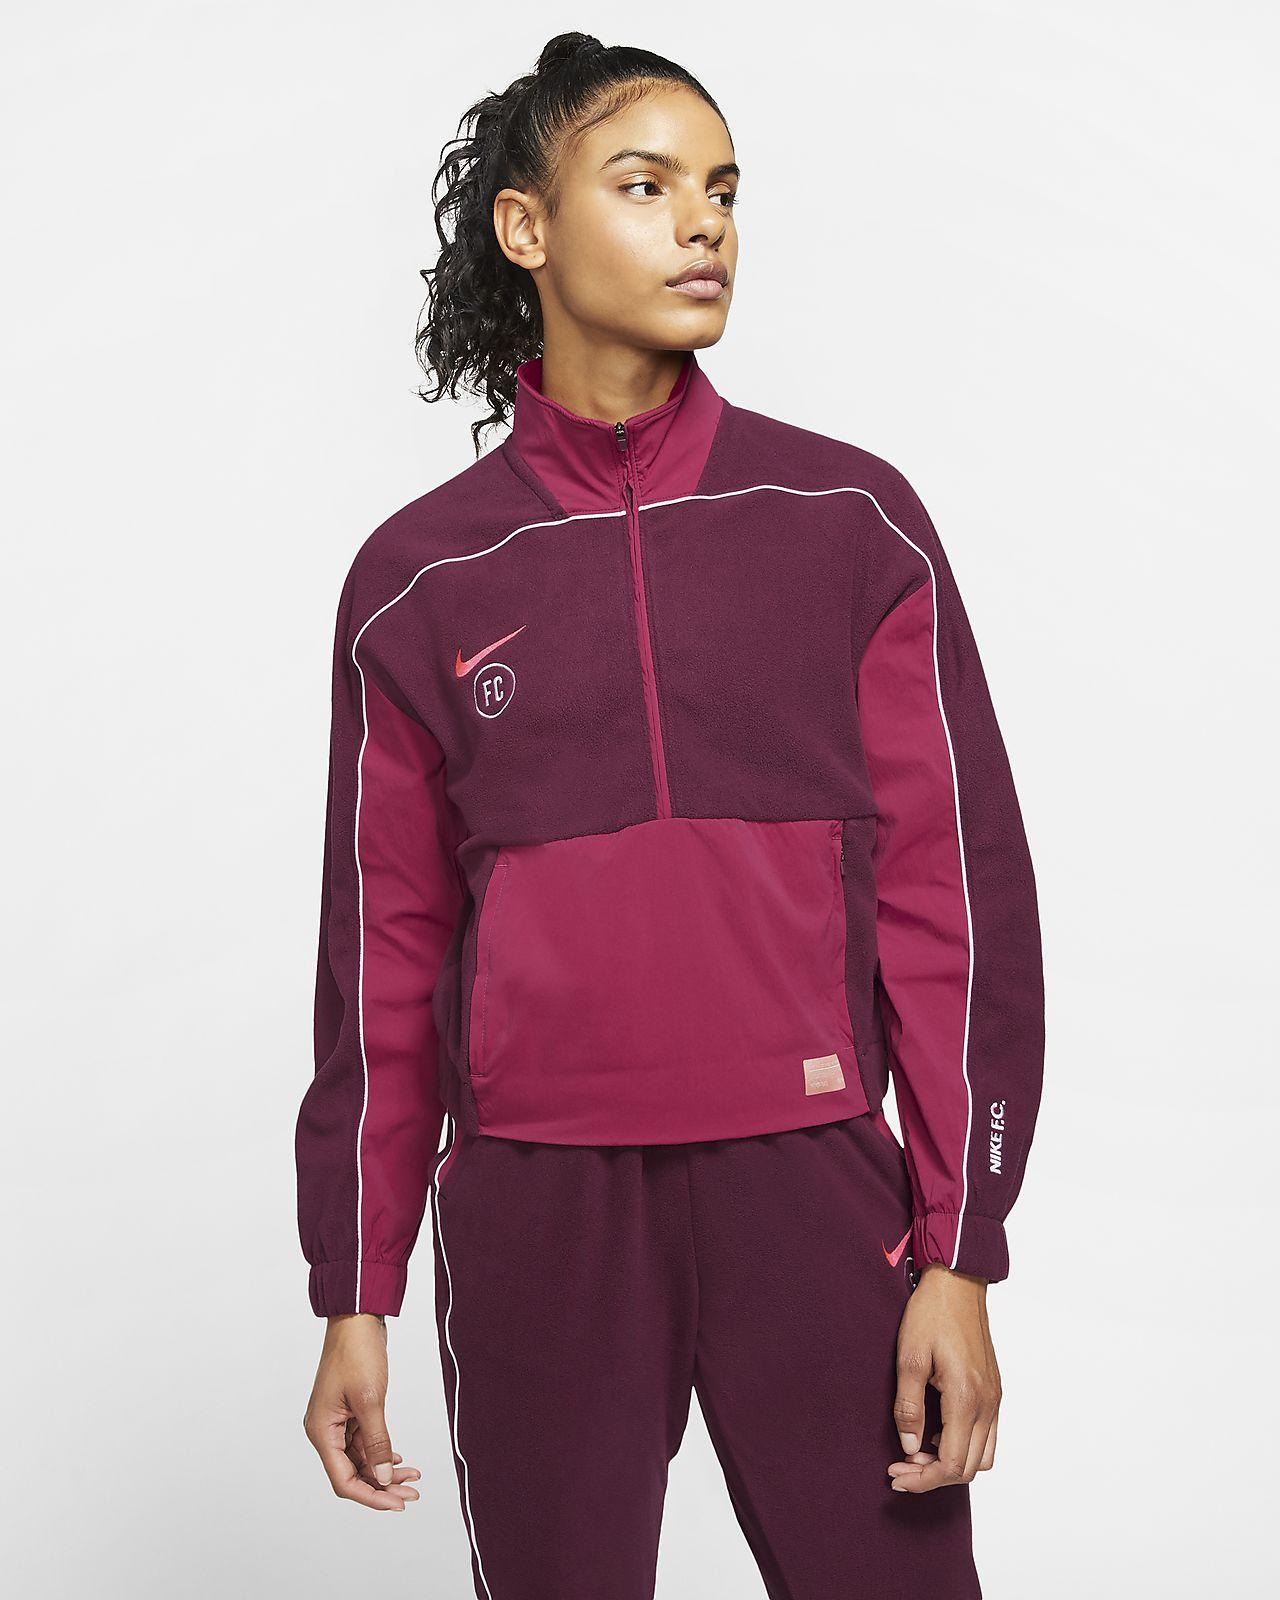 Nike F.C. Women's Long-Sleeve Football Top